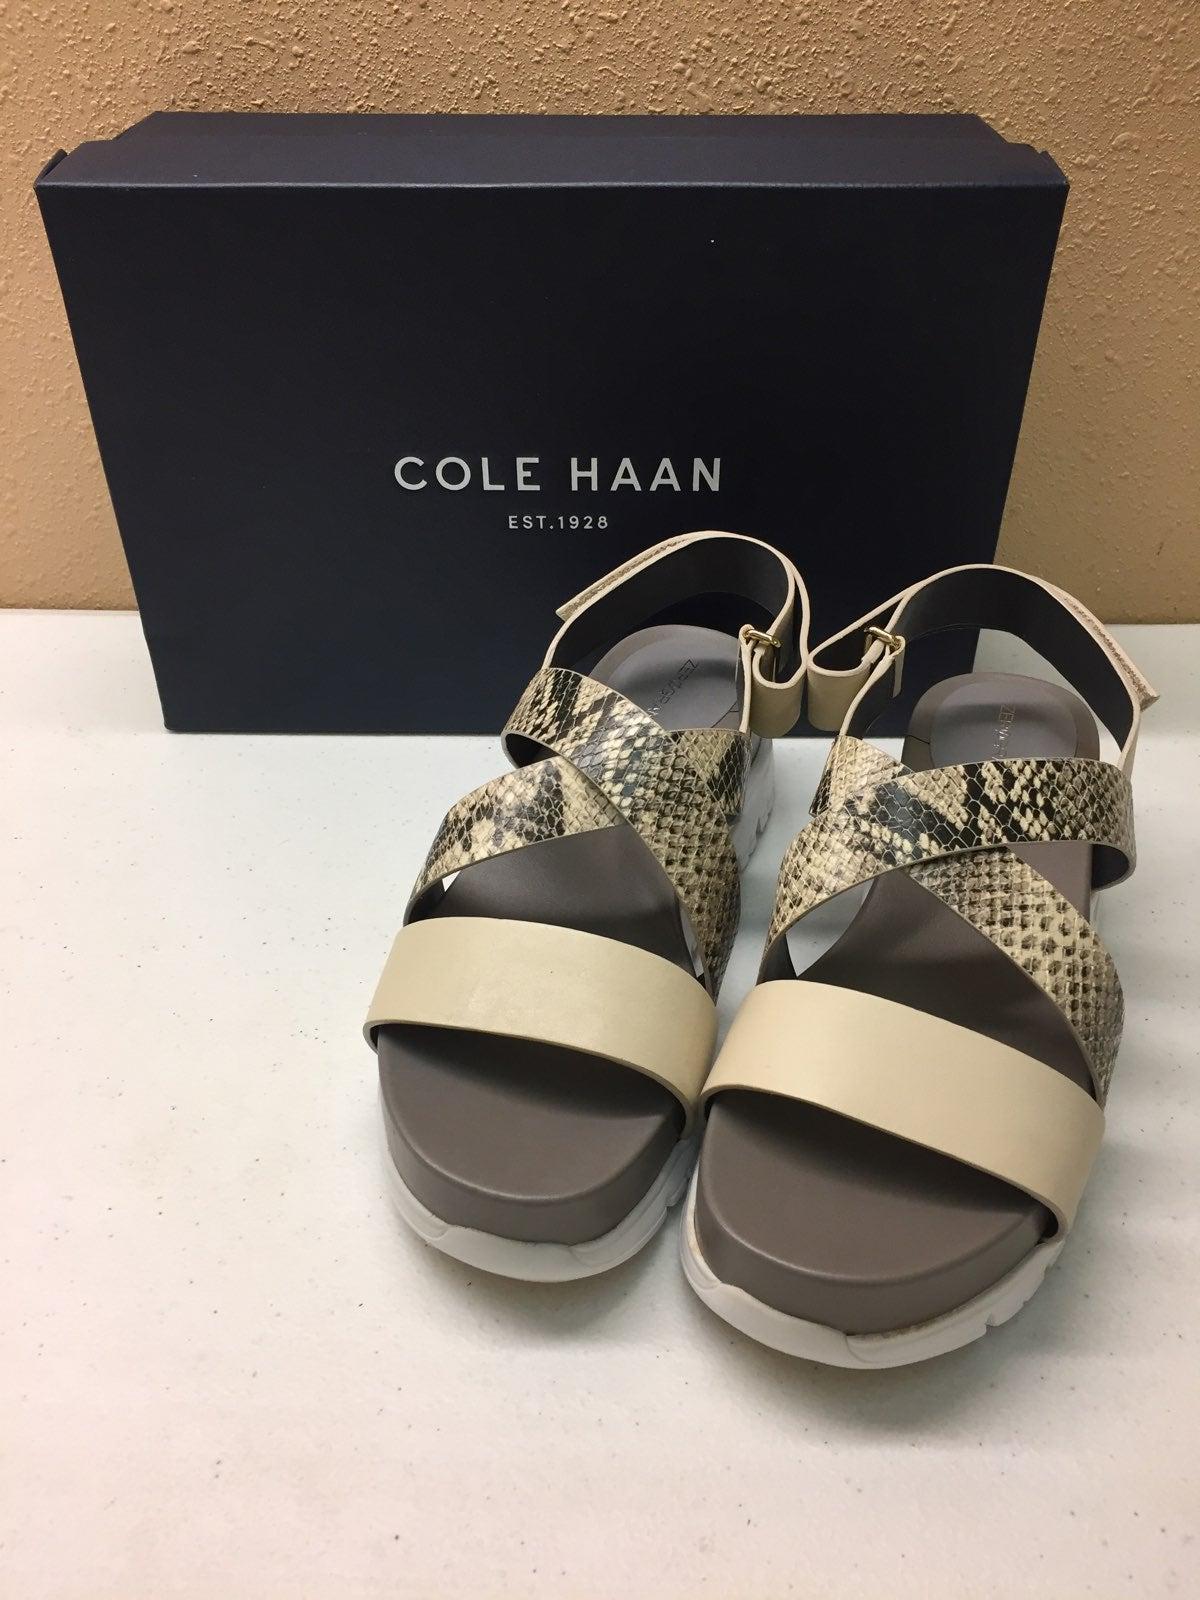 Cole Haan Multi Color Velcro Sandal 6M